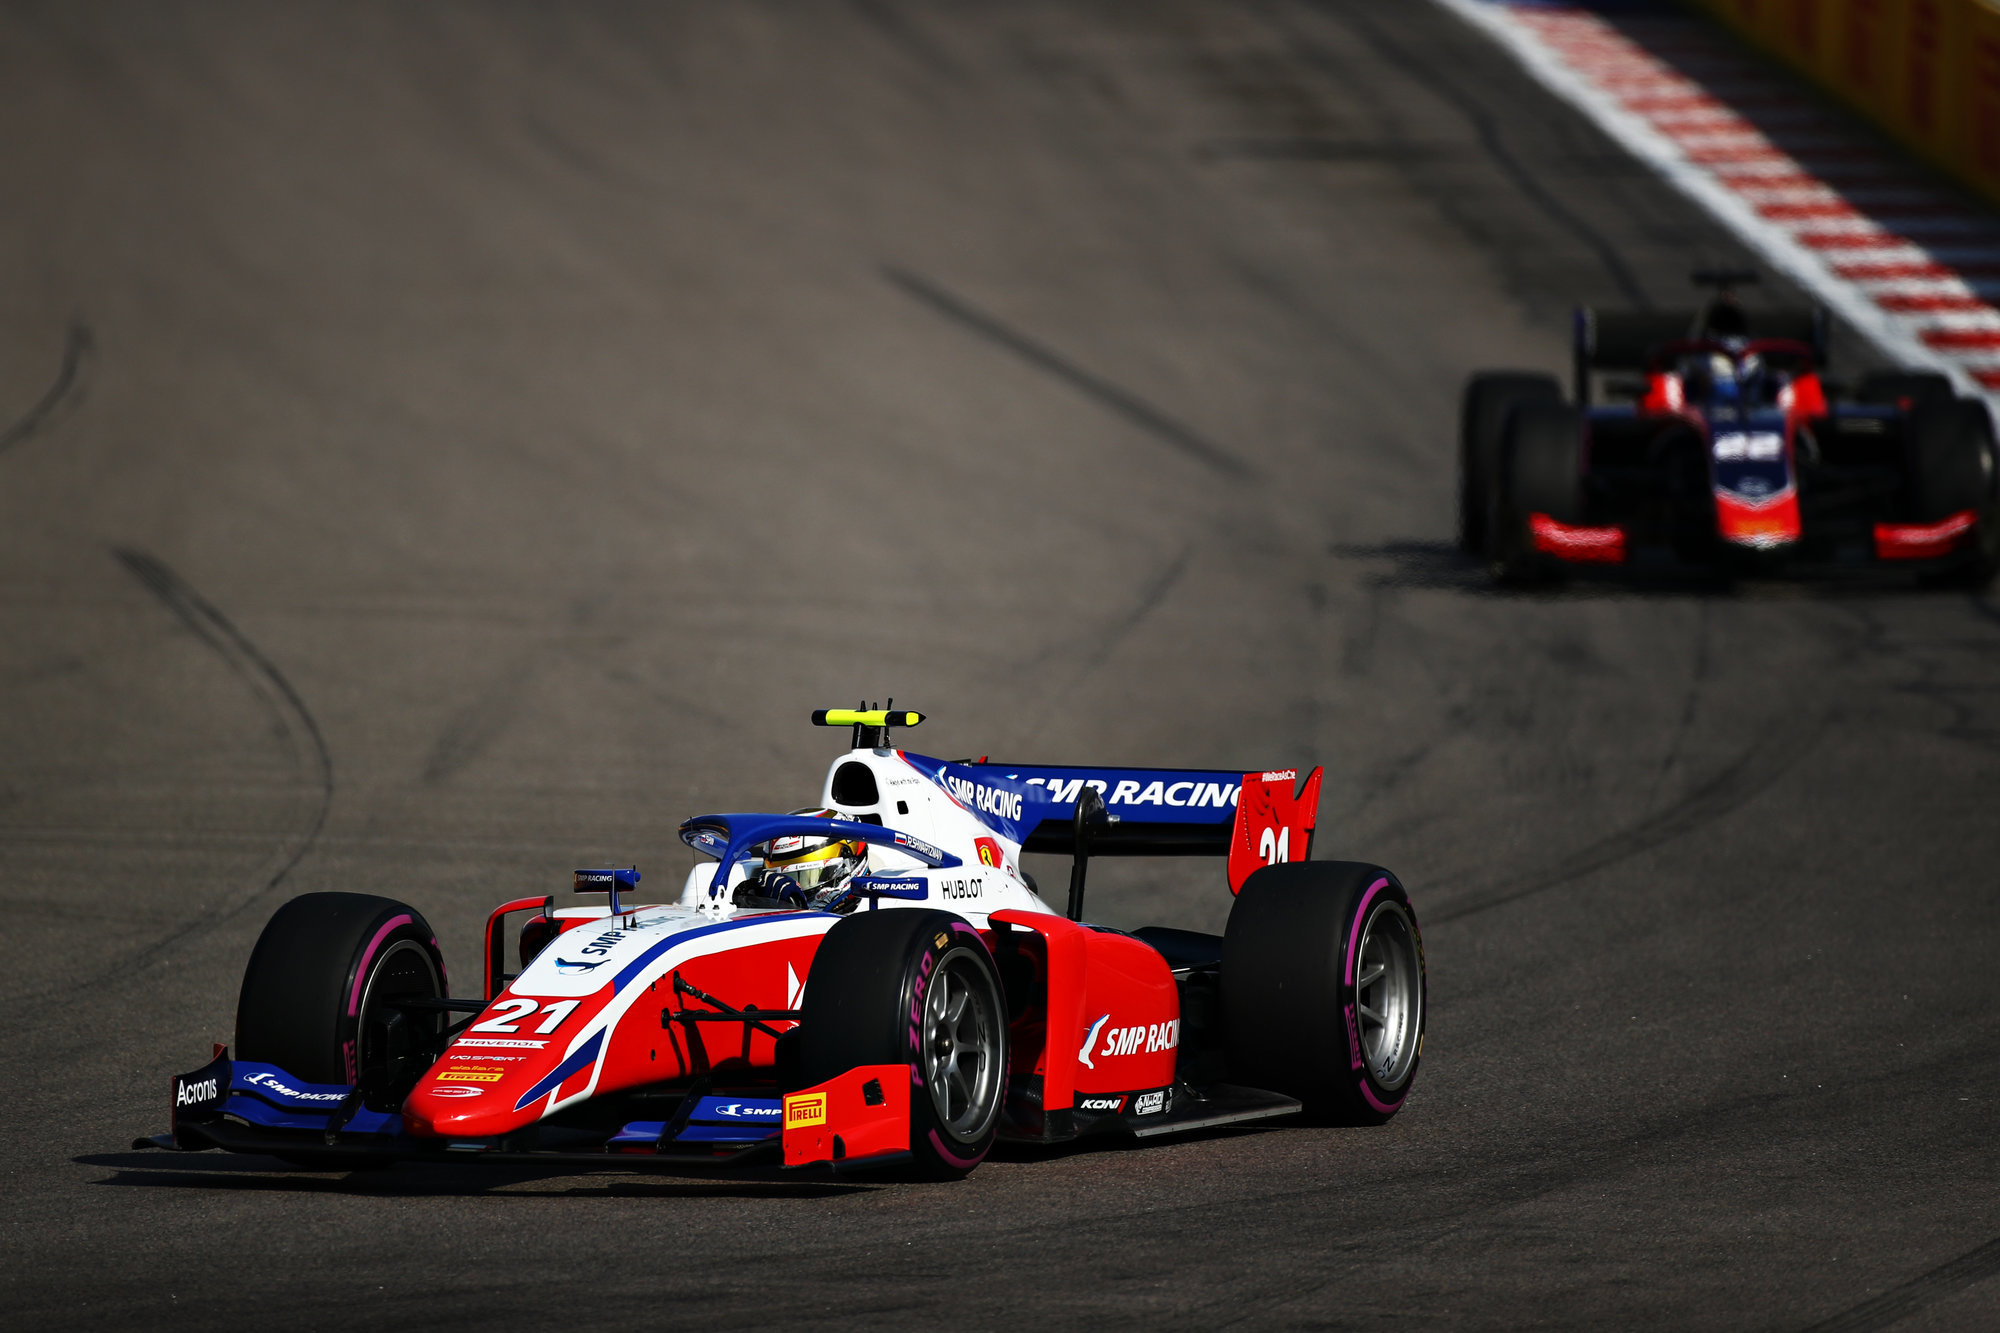 Чжоу показал первое время в квалификации Гран-при Бахрейна, Шварцман — 12-й